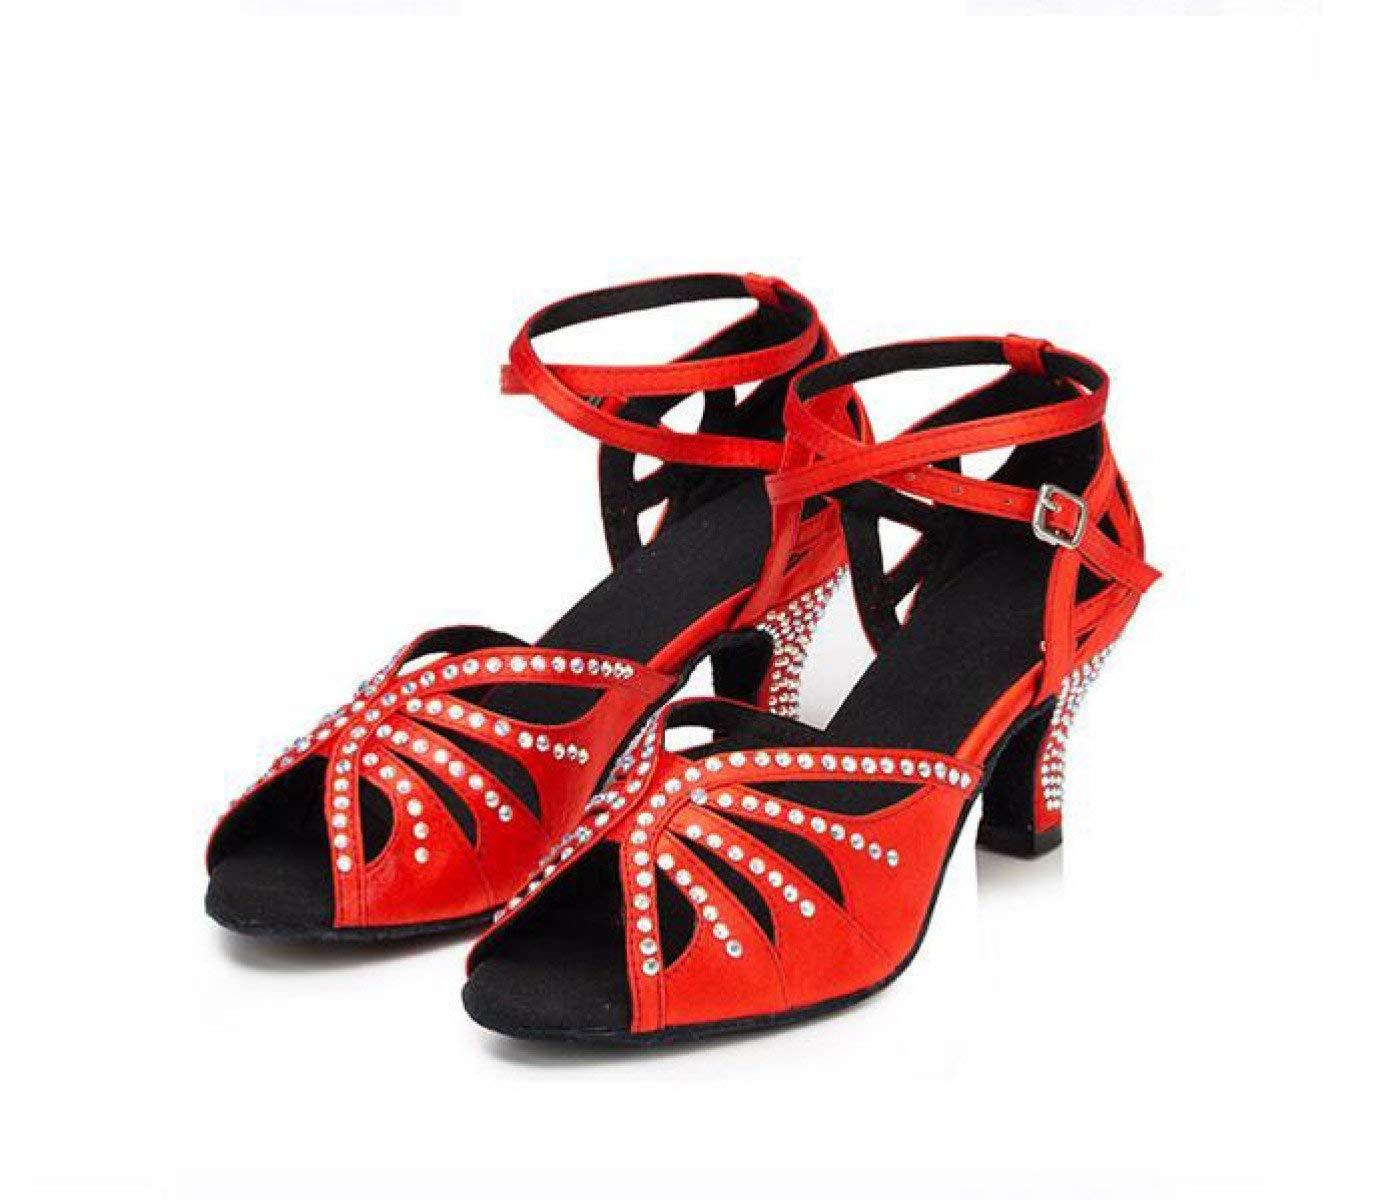 Frauen Kristalle Sparking Satin Latin Salsa Tanzschuhe Tango Chacha Chacha Chacha Samba Modern Jazz Schuhe Sandalen High Heels BlauHeeled7.5cm-UK4   EU35   Our36 44f580